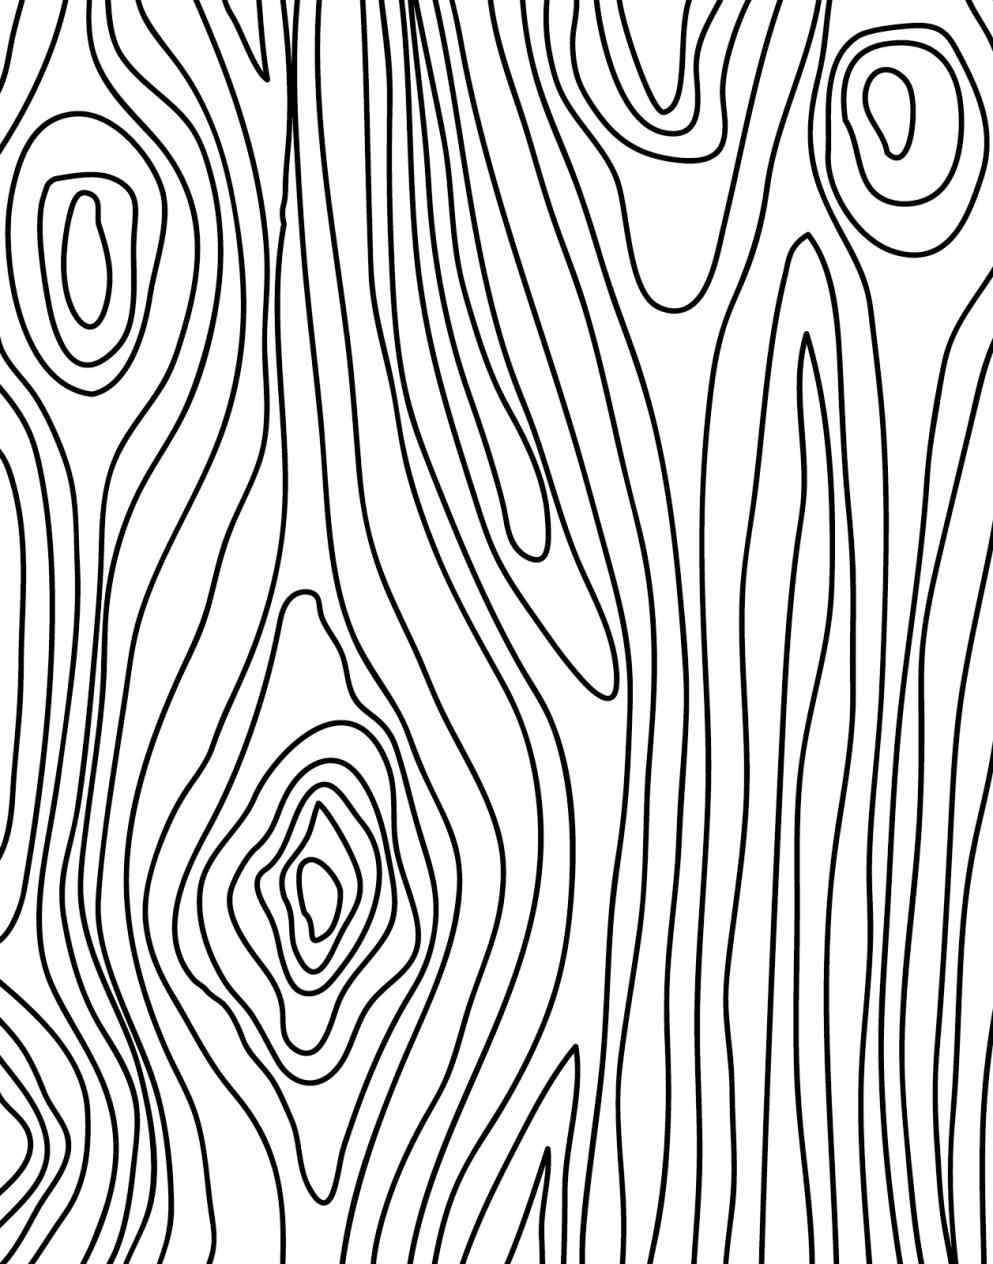 993x1264 Wood Grain Texture Vector Black And White Tristano.win